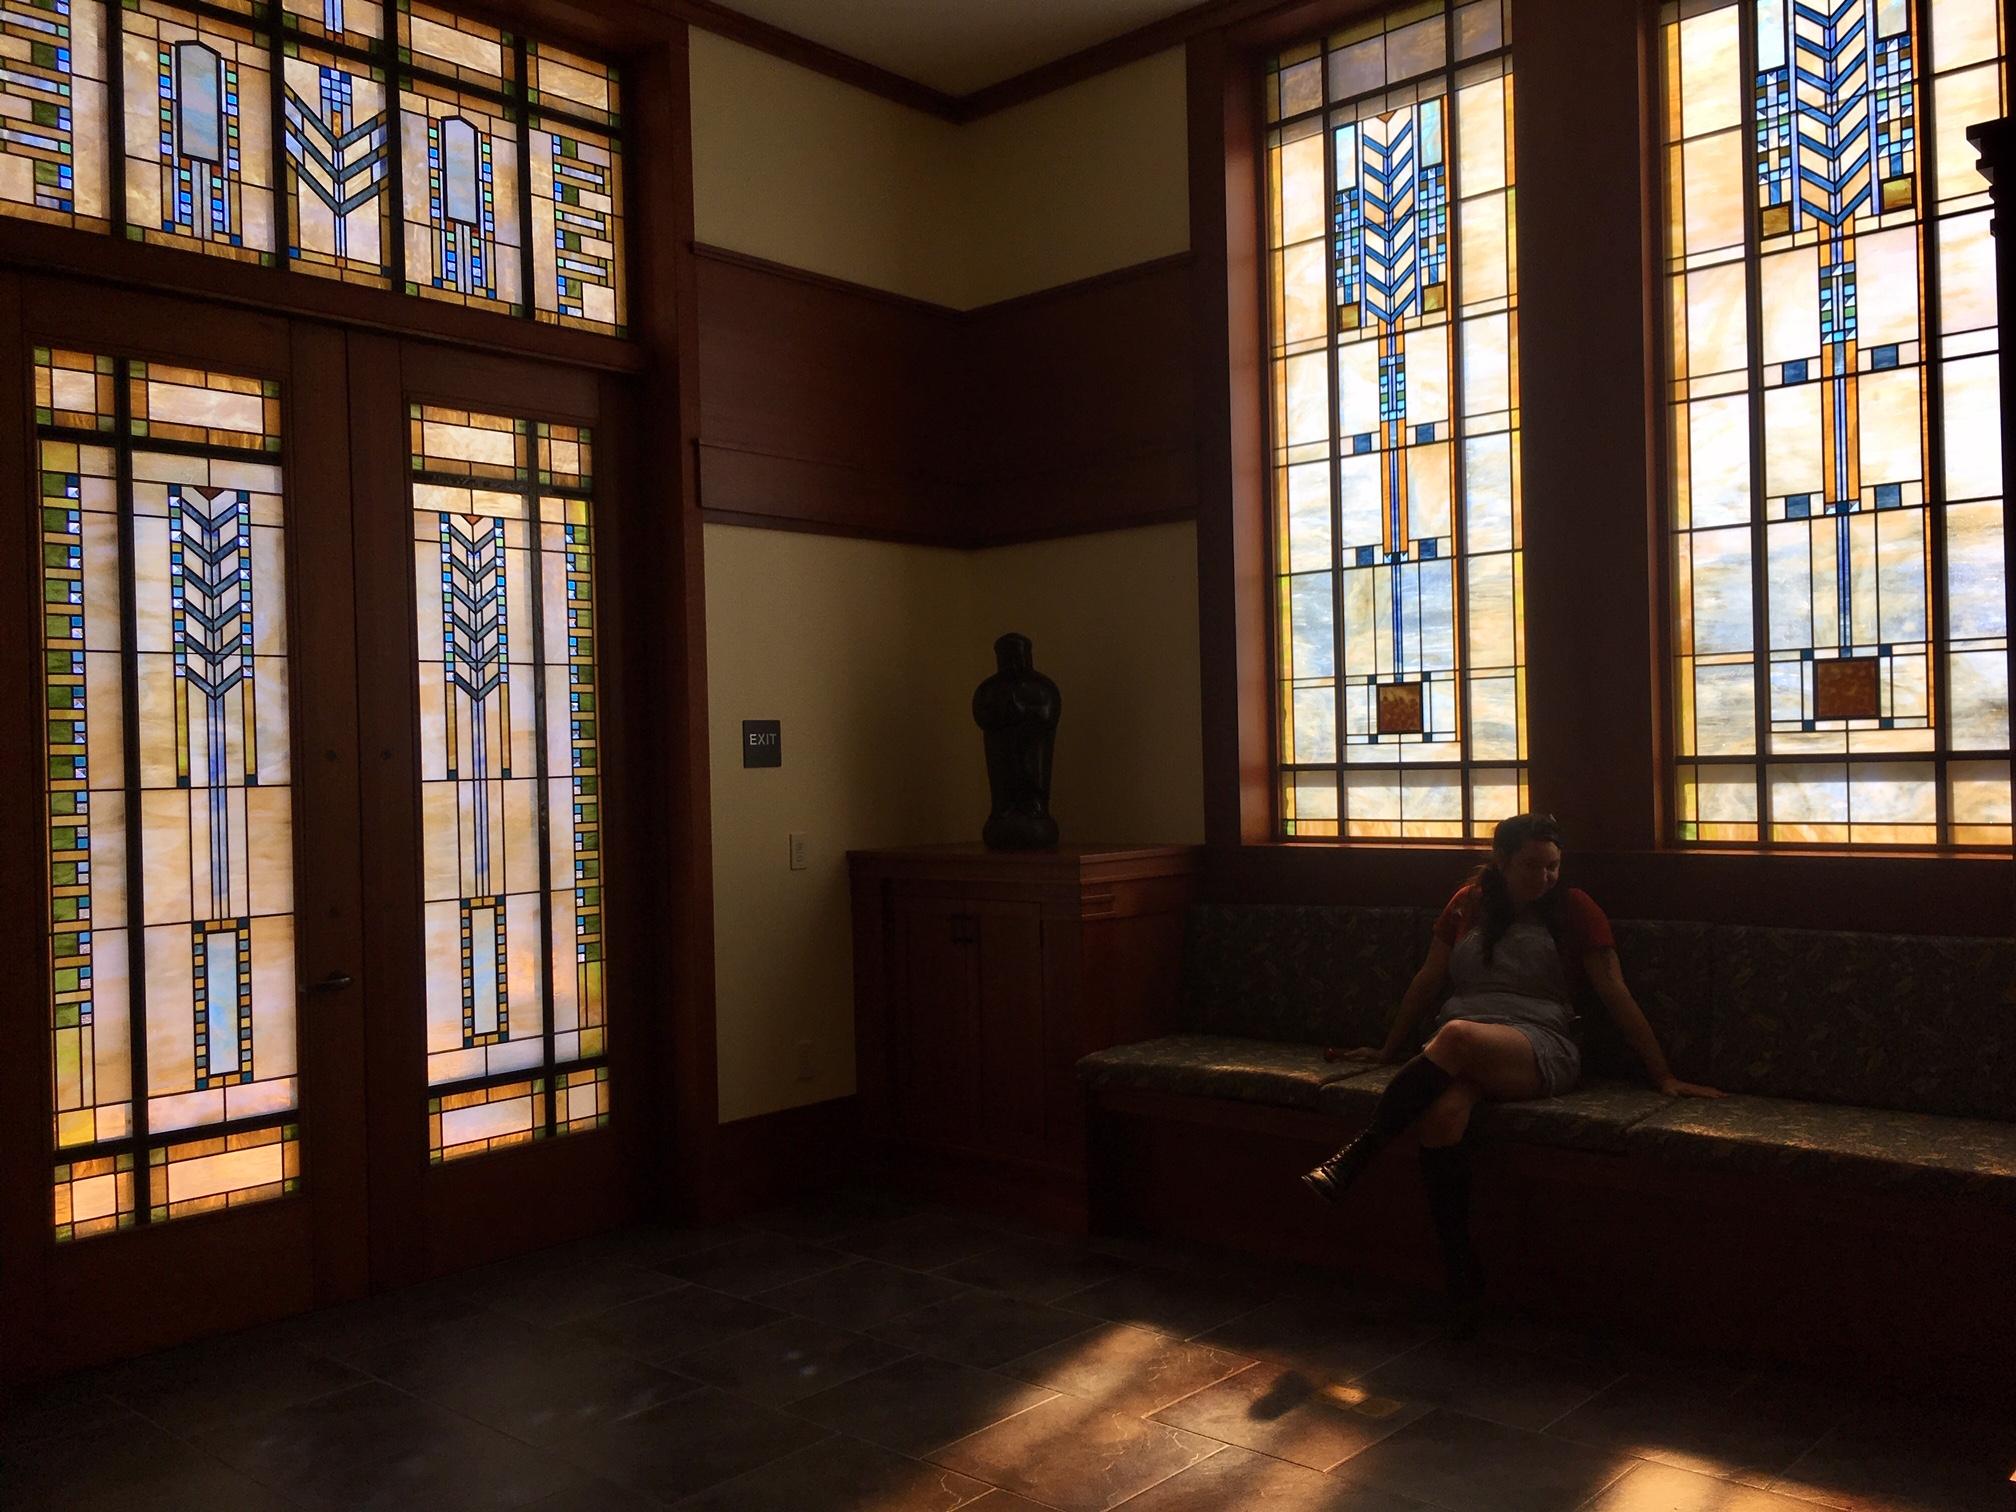 Doorway and windows of the winery tasting room.